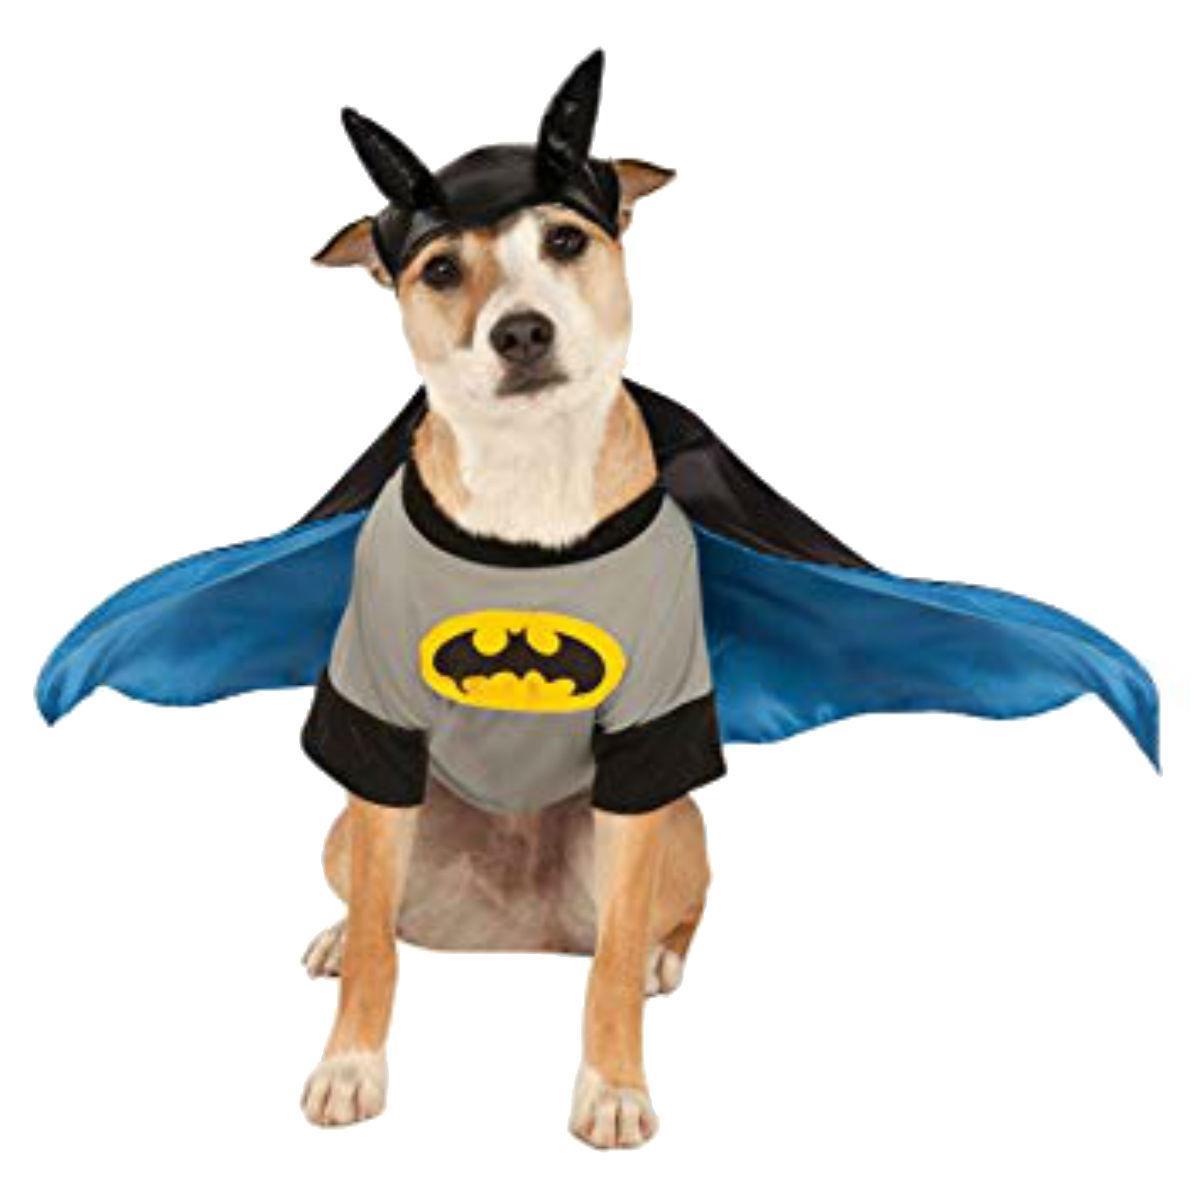 DC Batman Dog Halloween Costume by Rubies